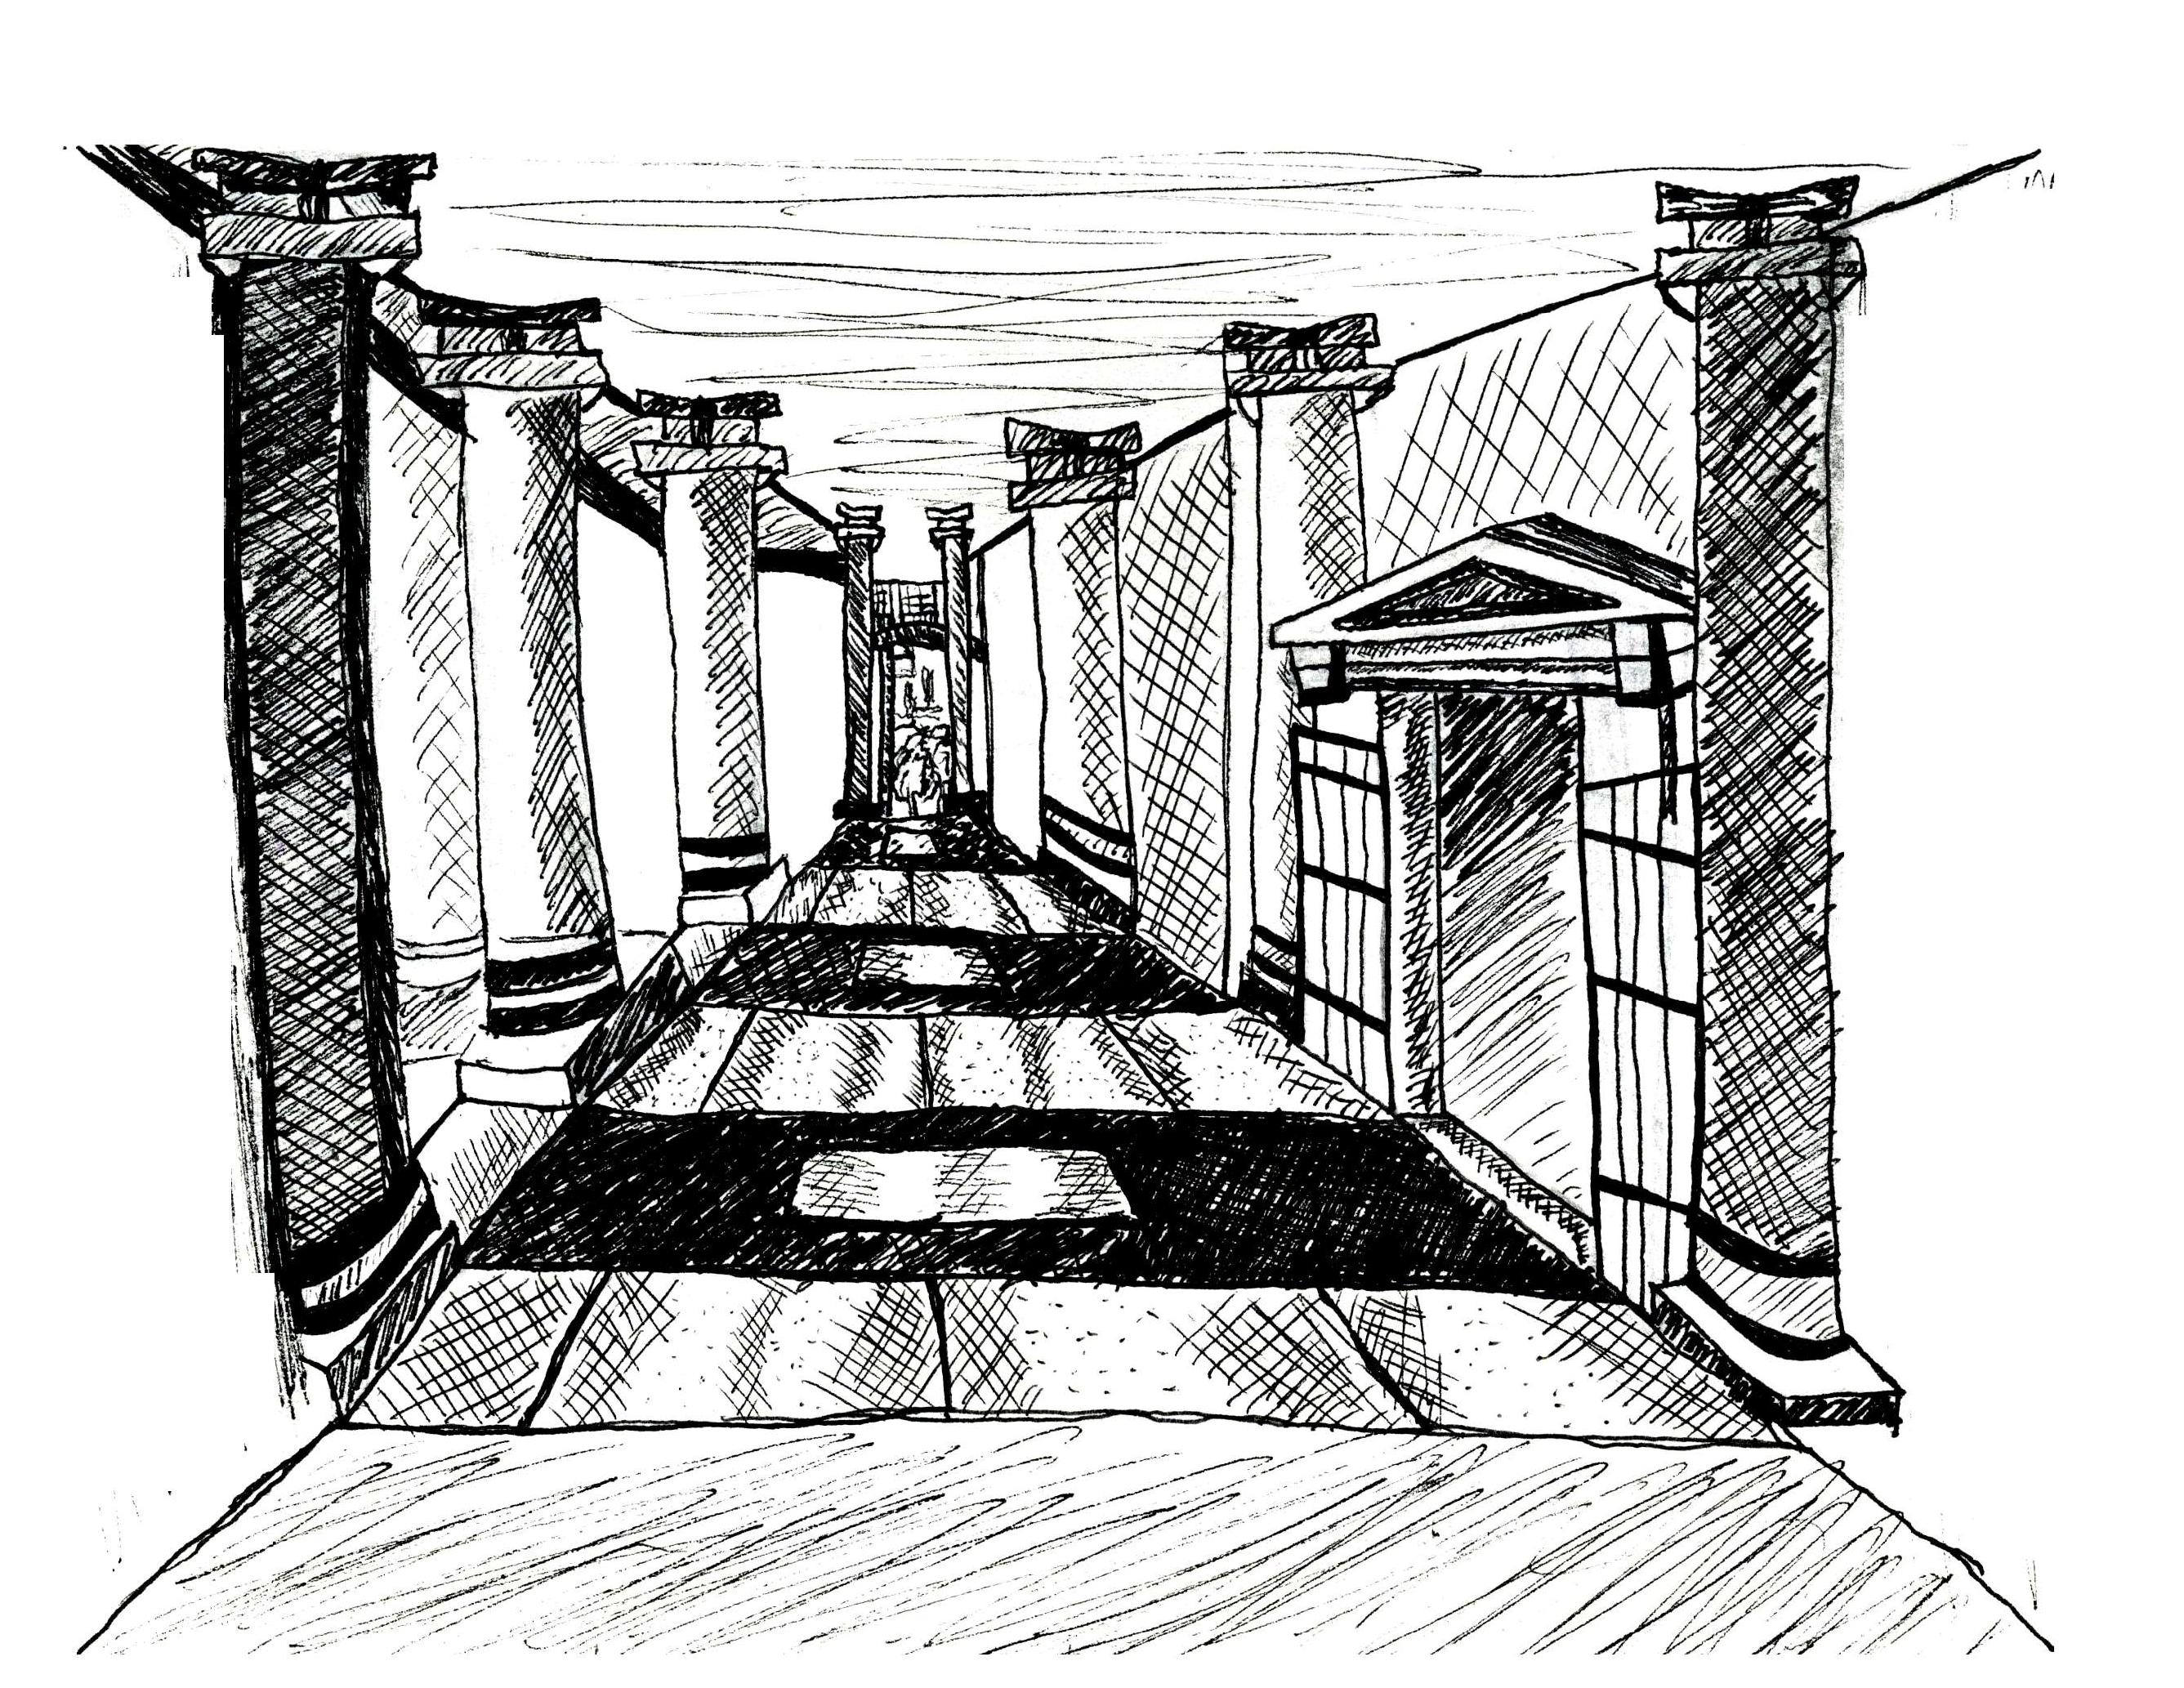 Study Abroad Sketch